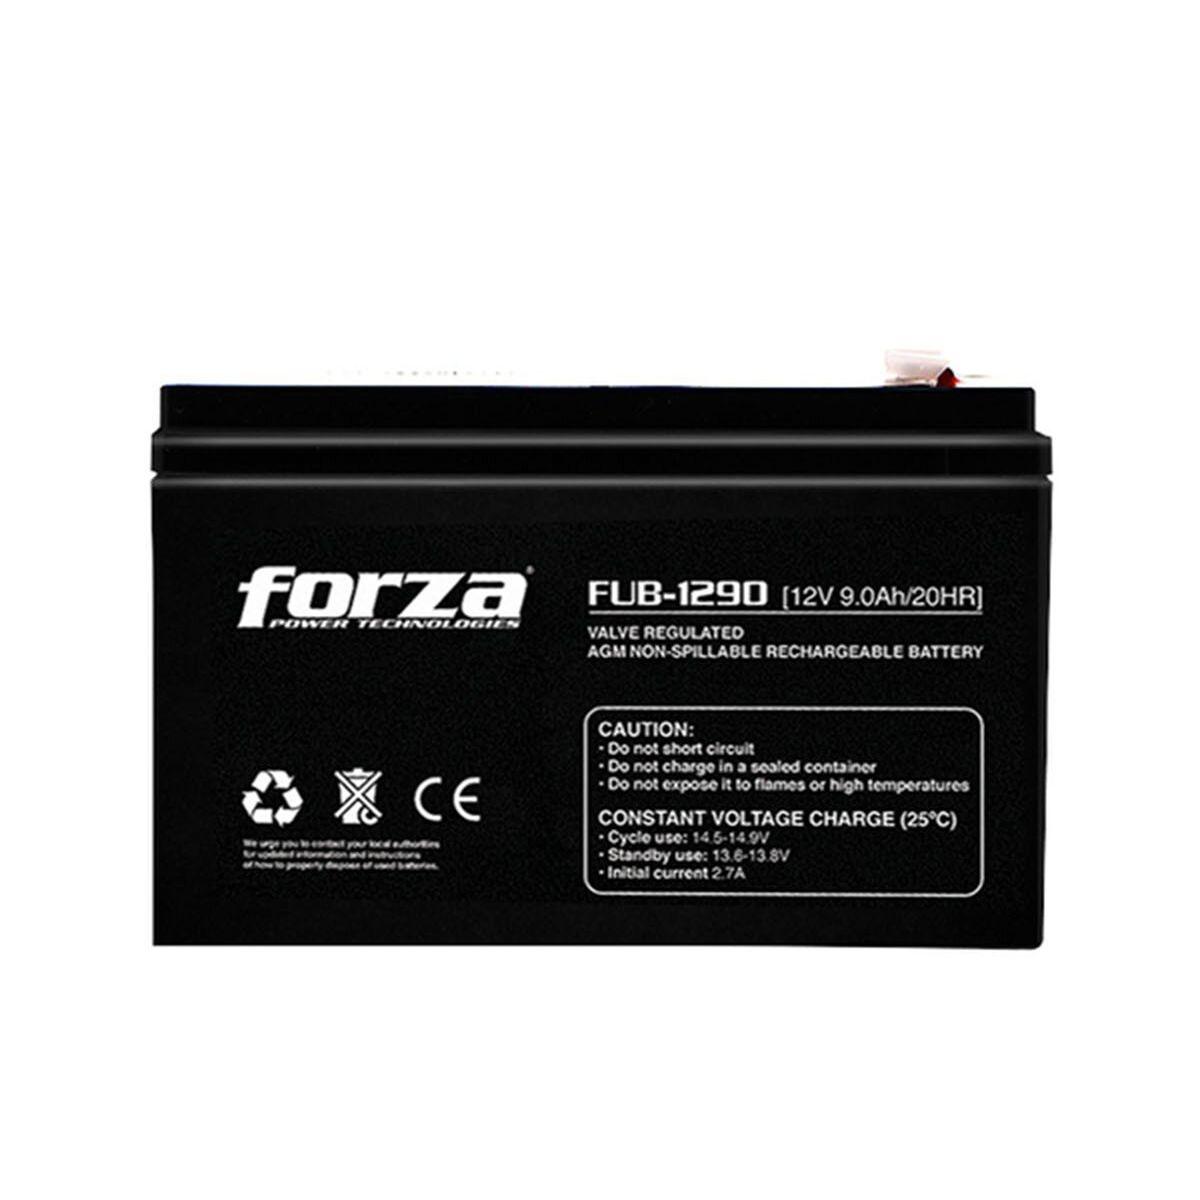 Batería 12V 9AH Forza FUB-1290 AGM